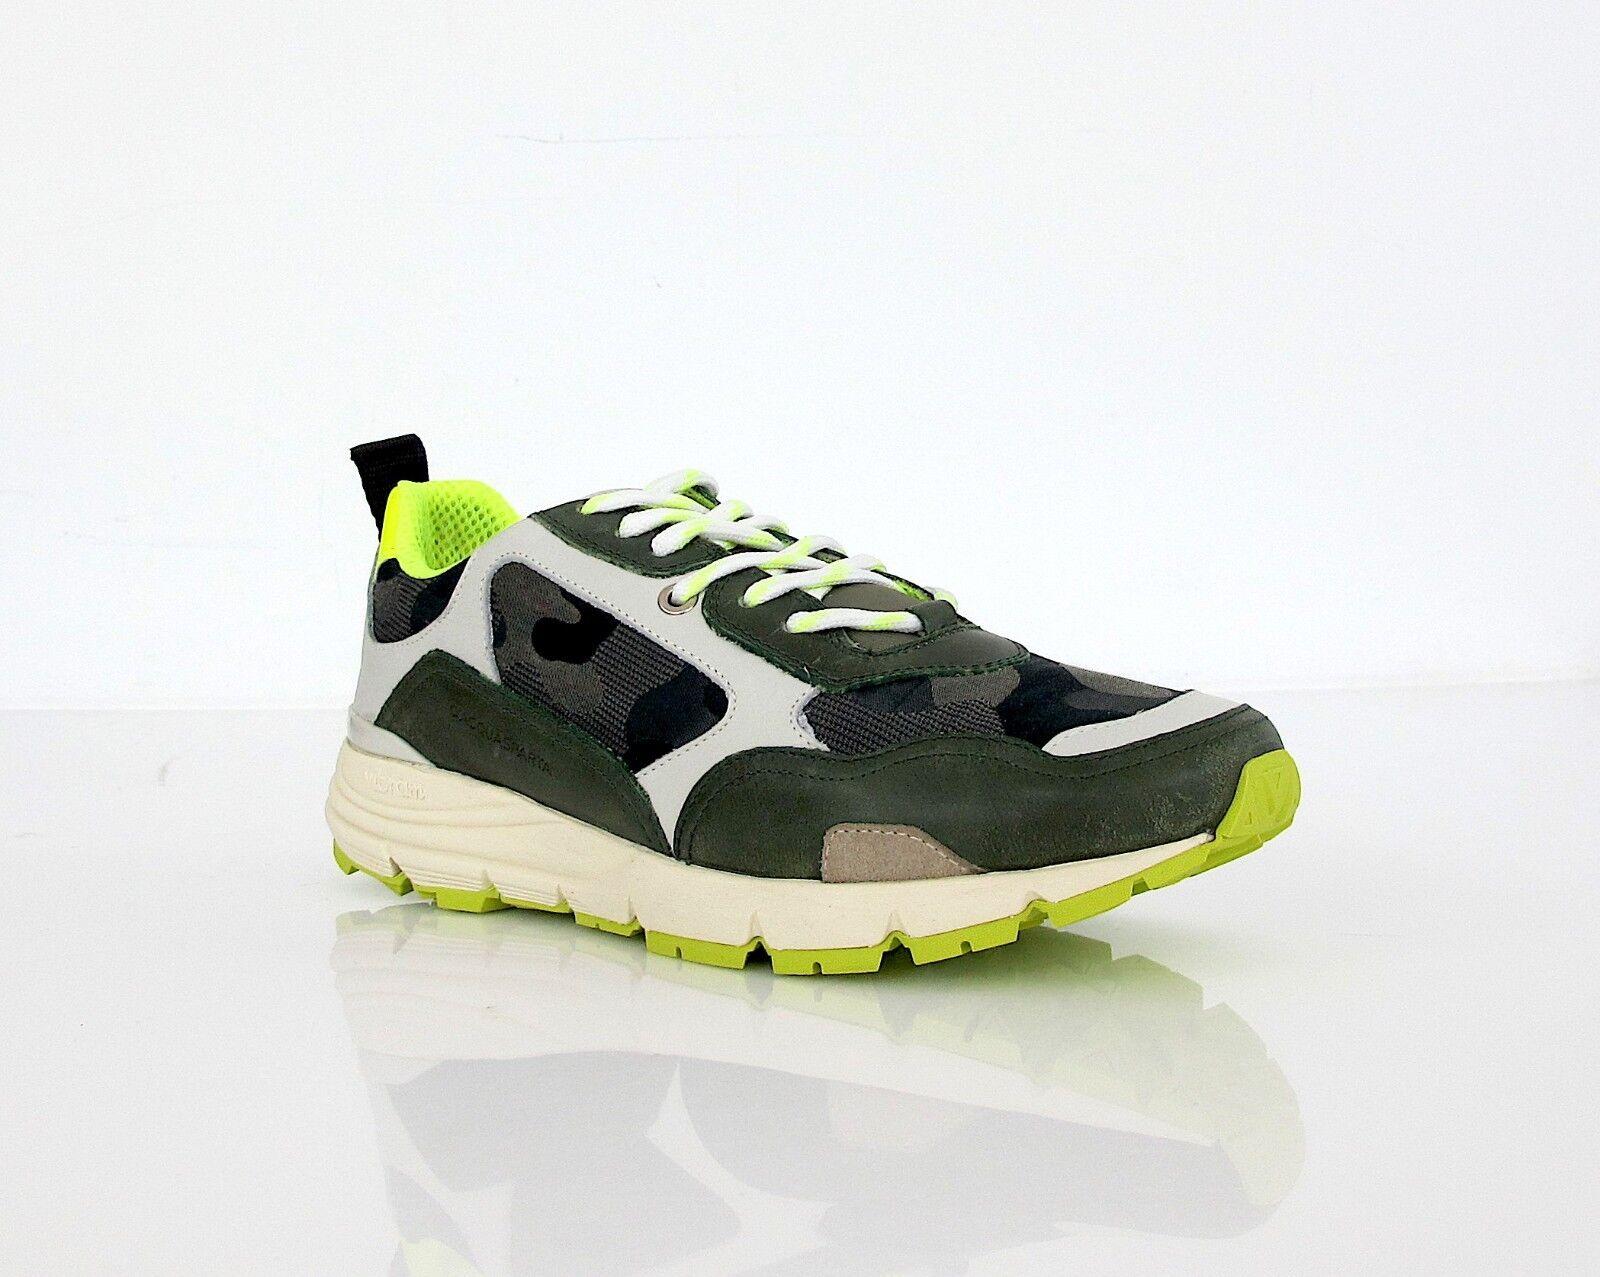 D'ACQUASPARTA scarpe/sneaker uomo BRUNELL U200 BM col.CAMOUFLAGE estate estate estate 2018 170d29